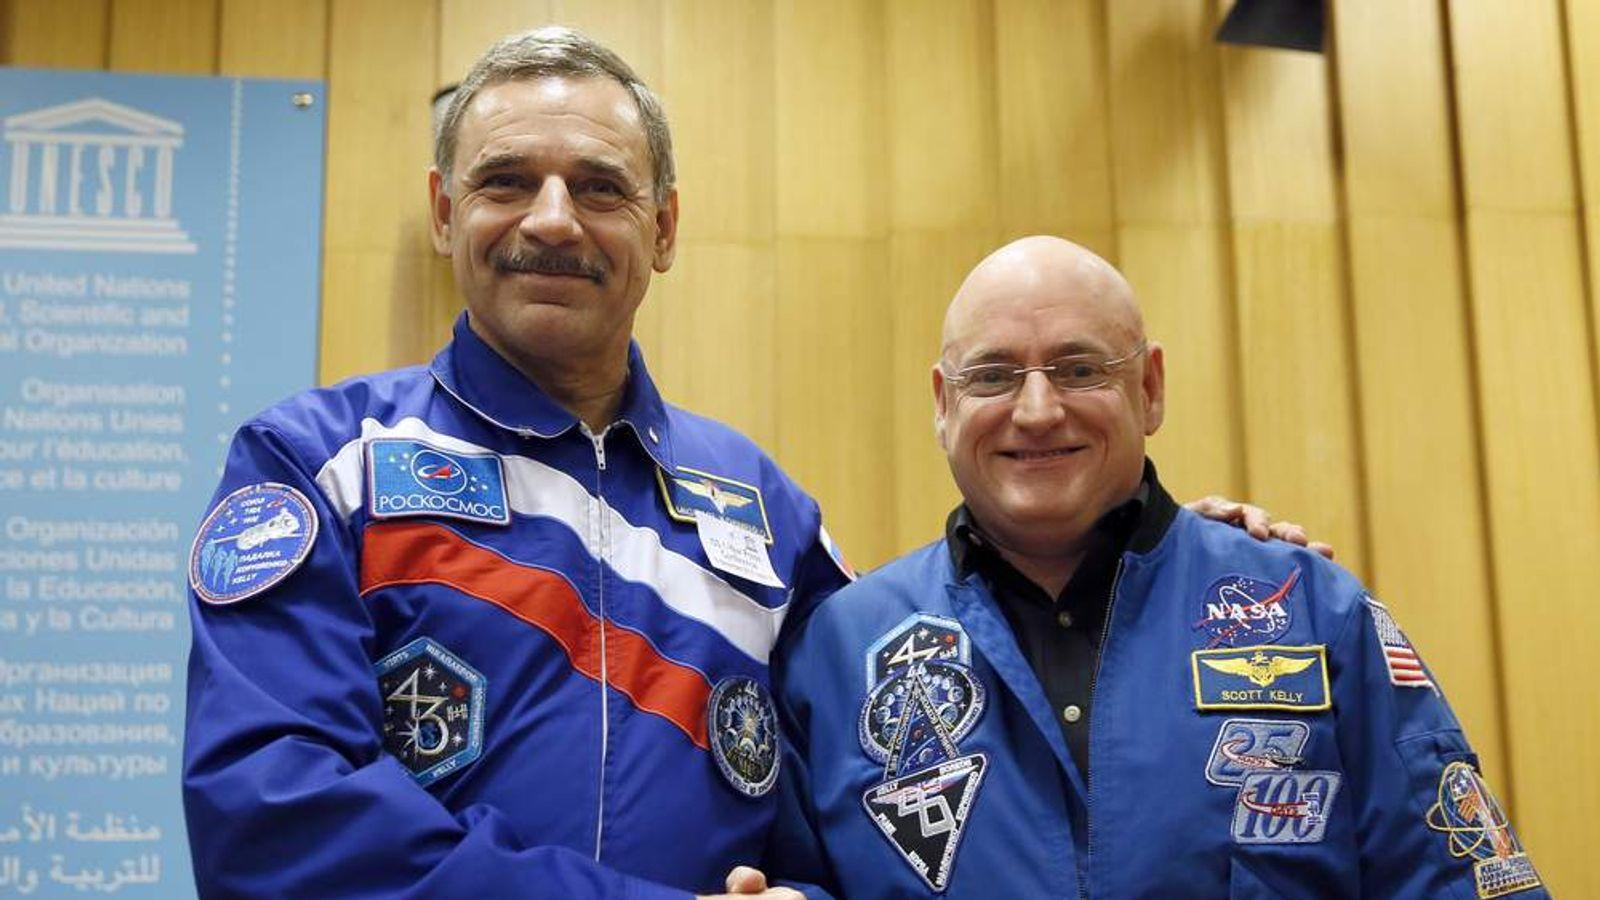 NASA astronaut Scott Kelly (R) and Roscosmos cosmonaut Mikhail Kornienko